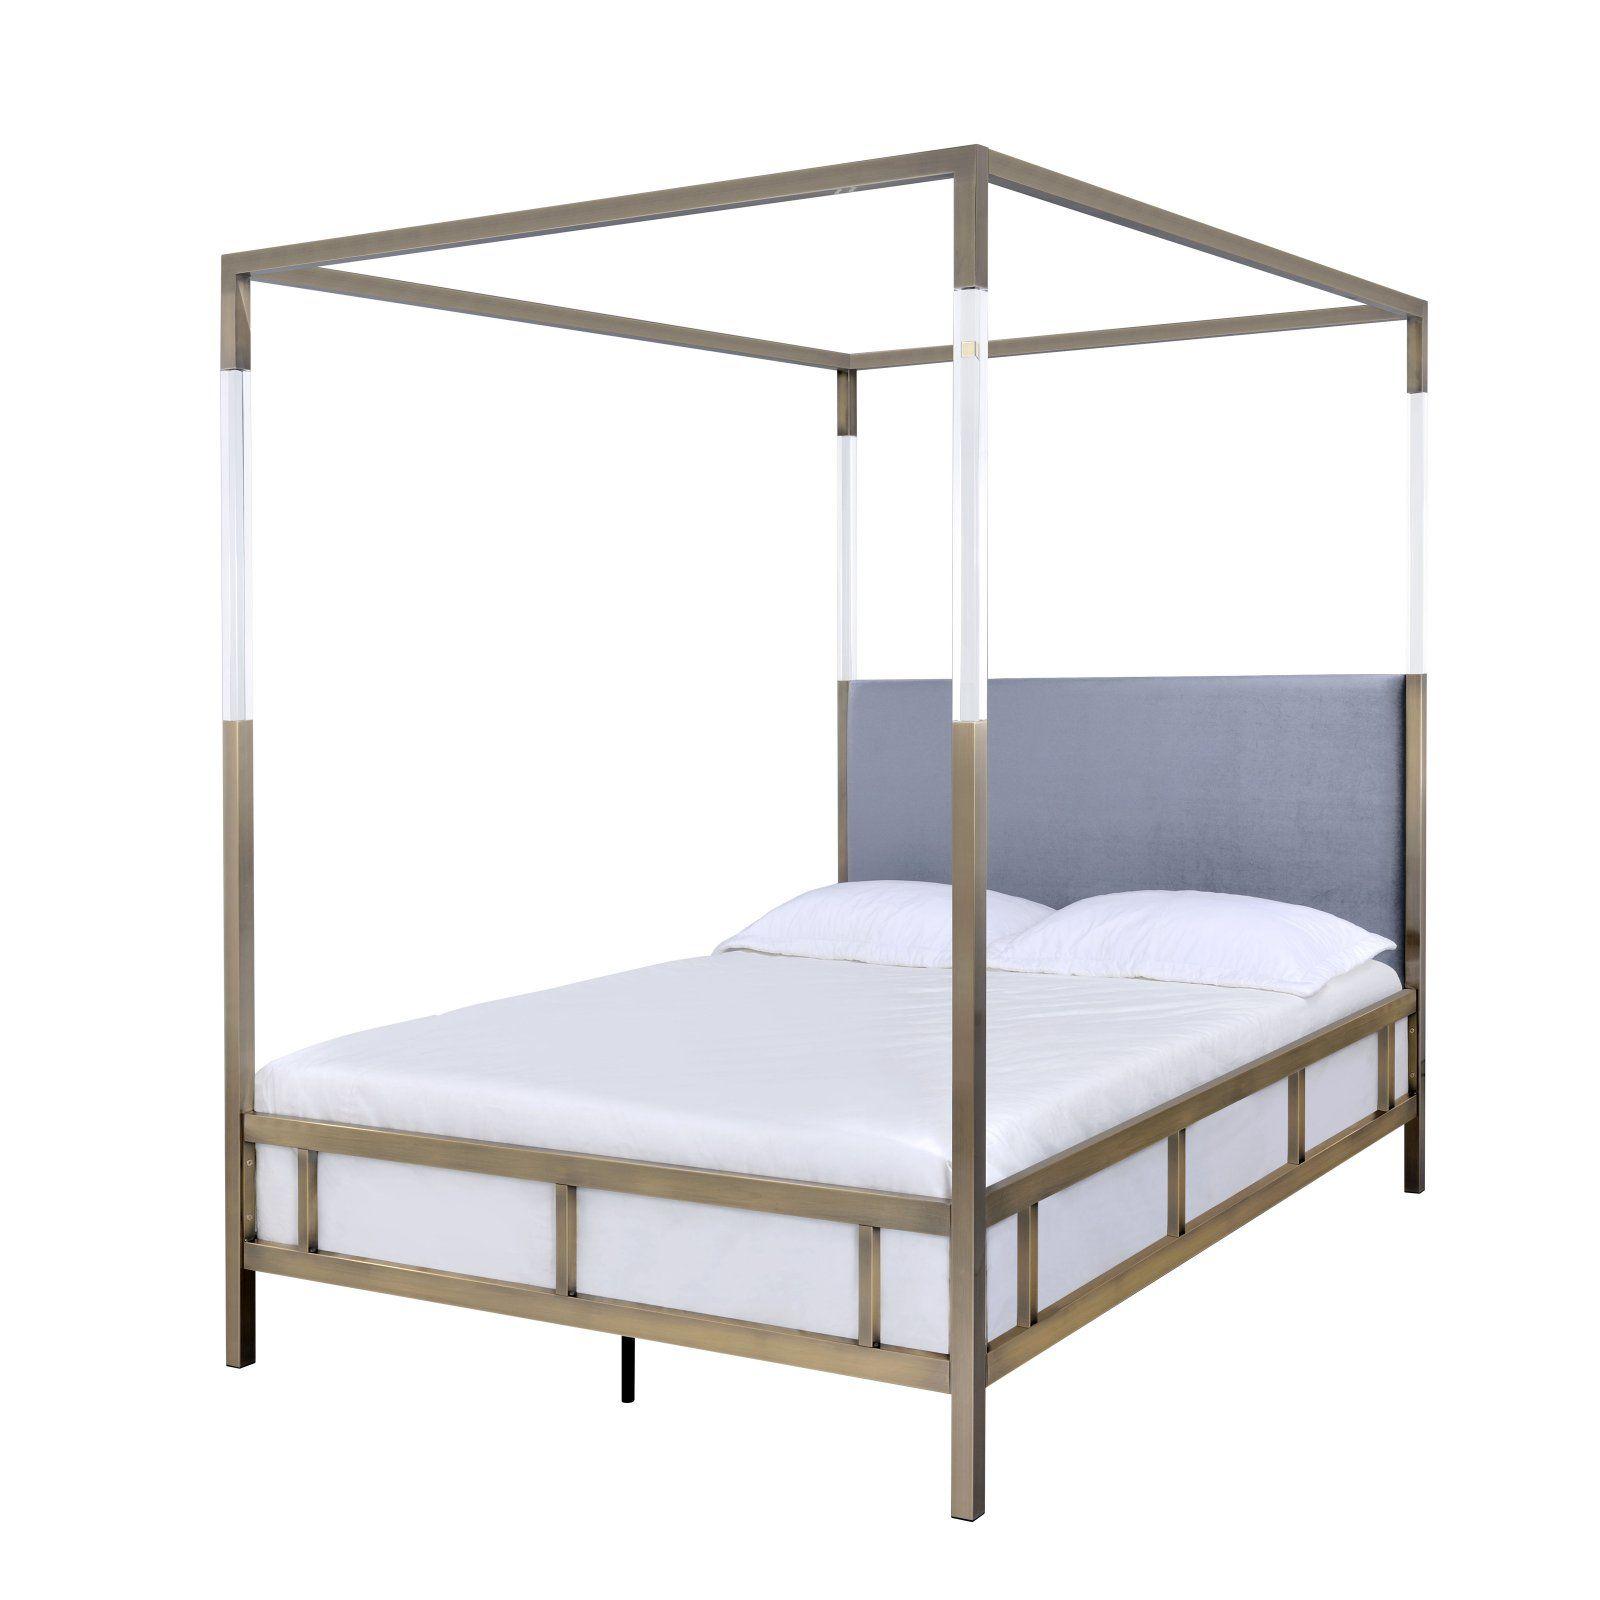 40e8f0f1f610 Urban Attitude Gold Justine Collection Queen Size Canopy Bed ...